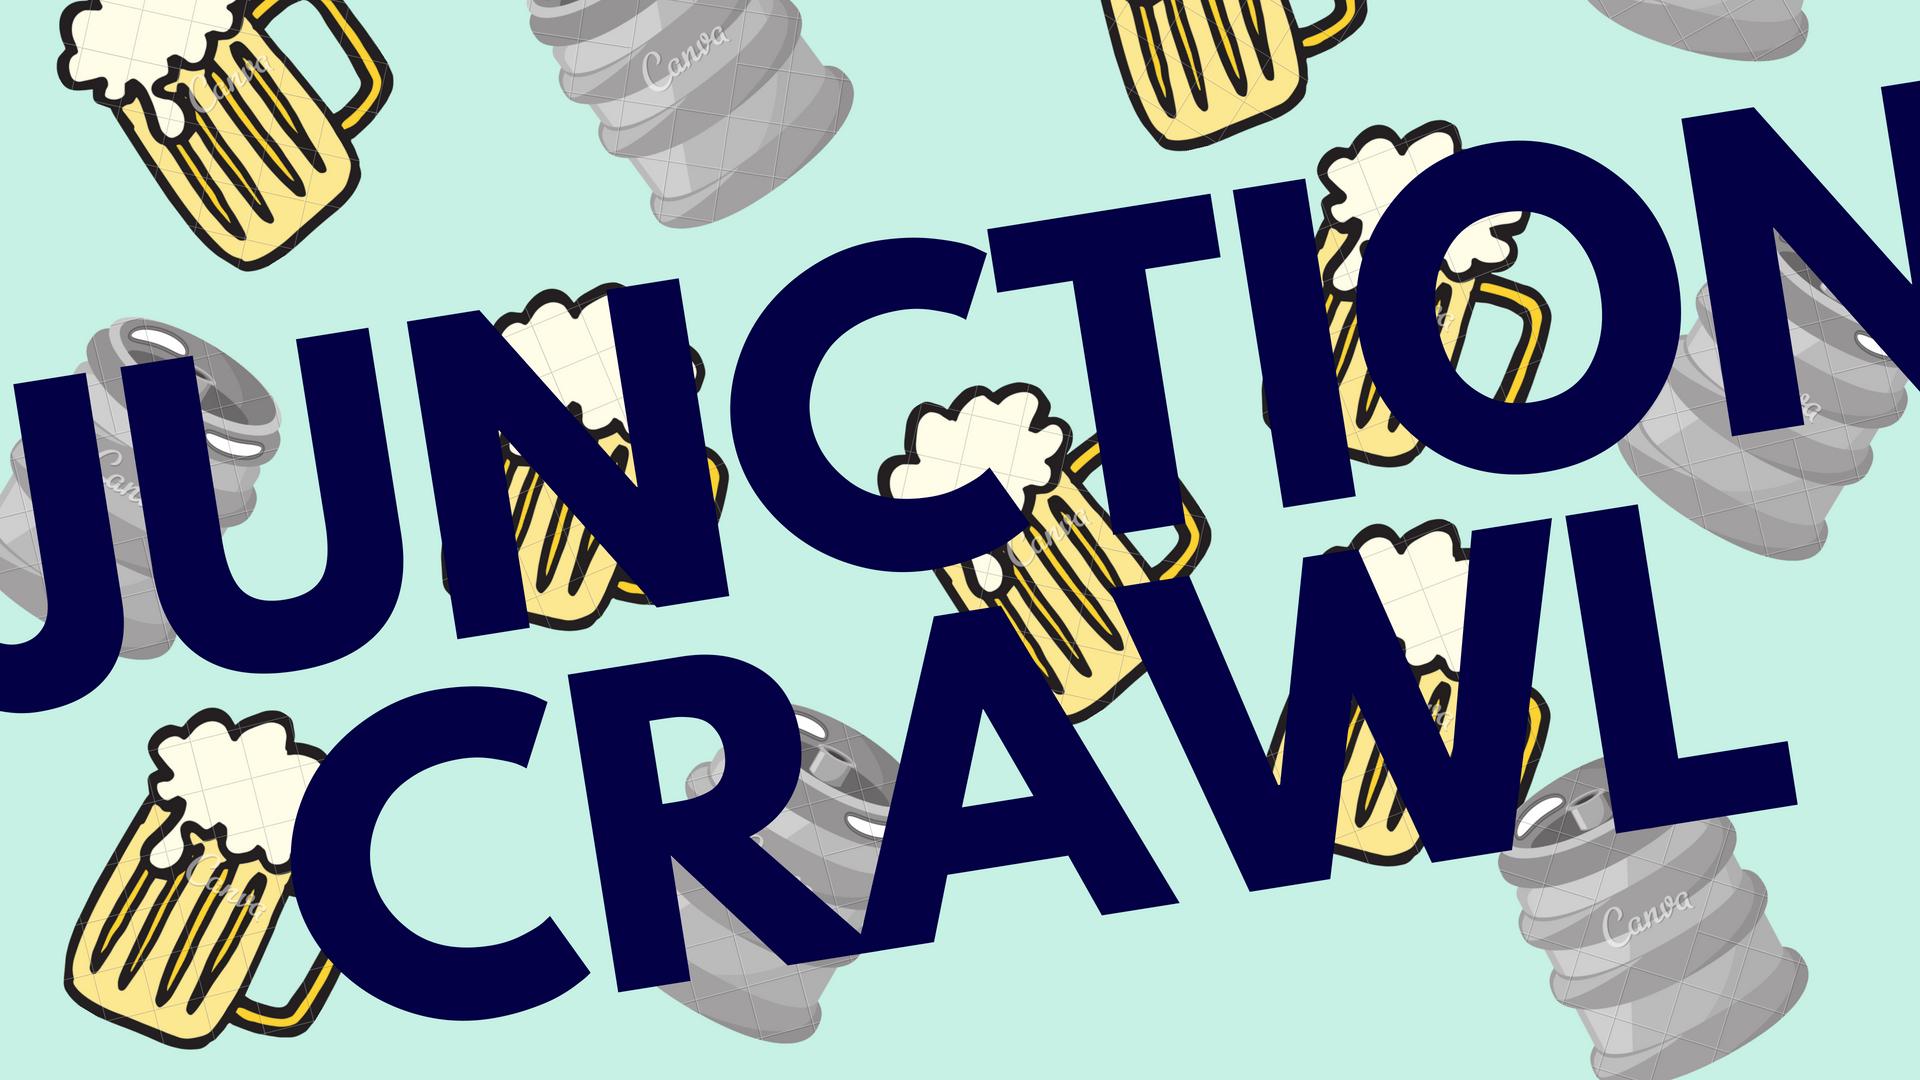 Junction Crawl July 15 2018.jpg